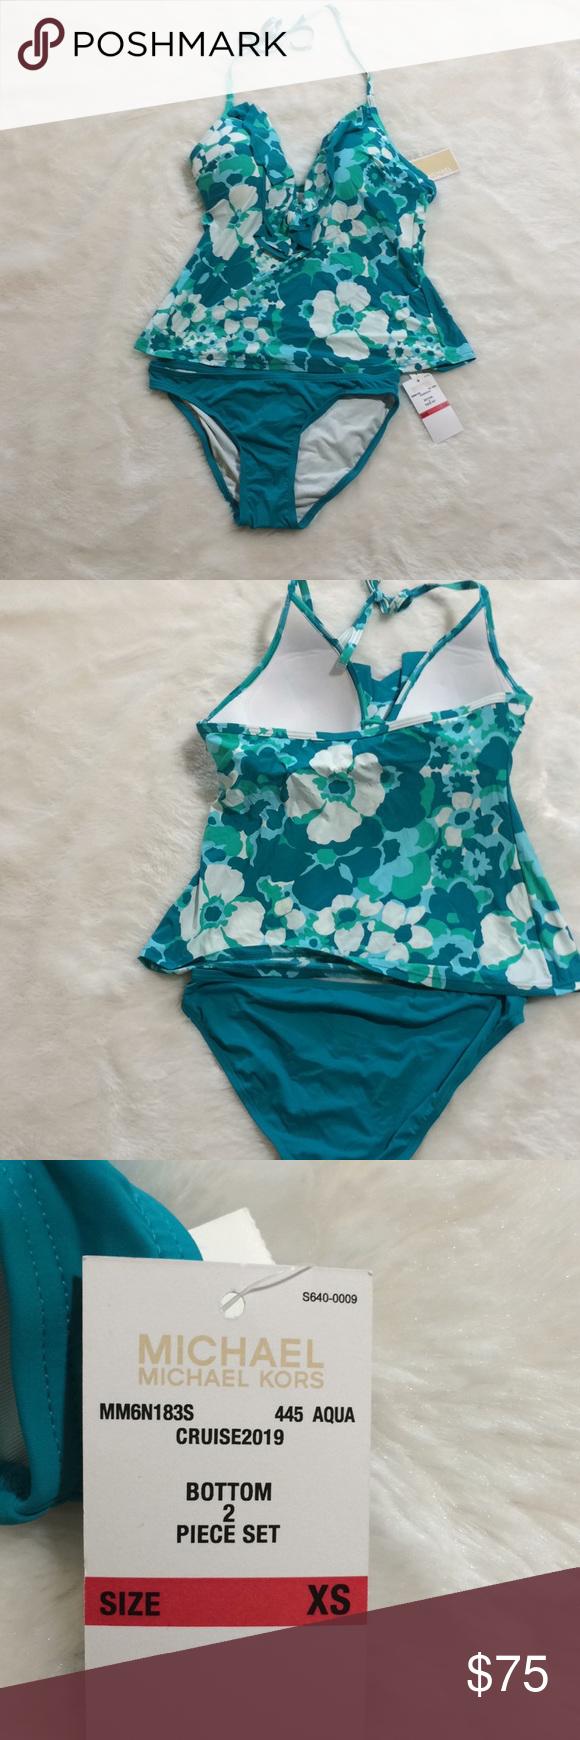 1c58a34e373c6 Michael Kors Cruise Aqua 2 Piece Swim NWT NWT - collection 2 piece bathing  suit - aqua cruise ruffle - green aqua and white floral print - size approx  xs ...